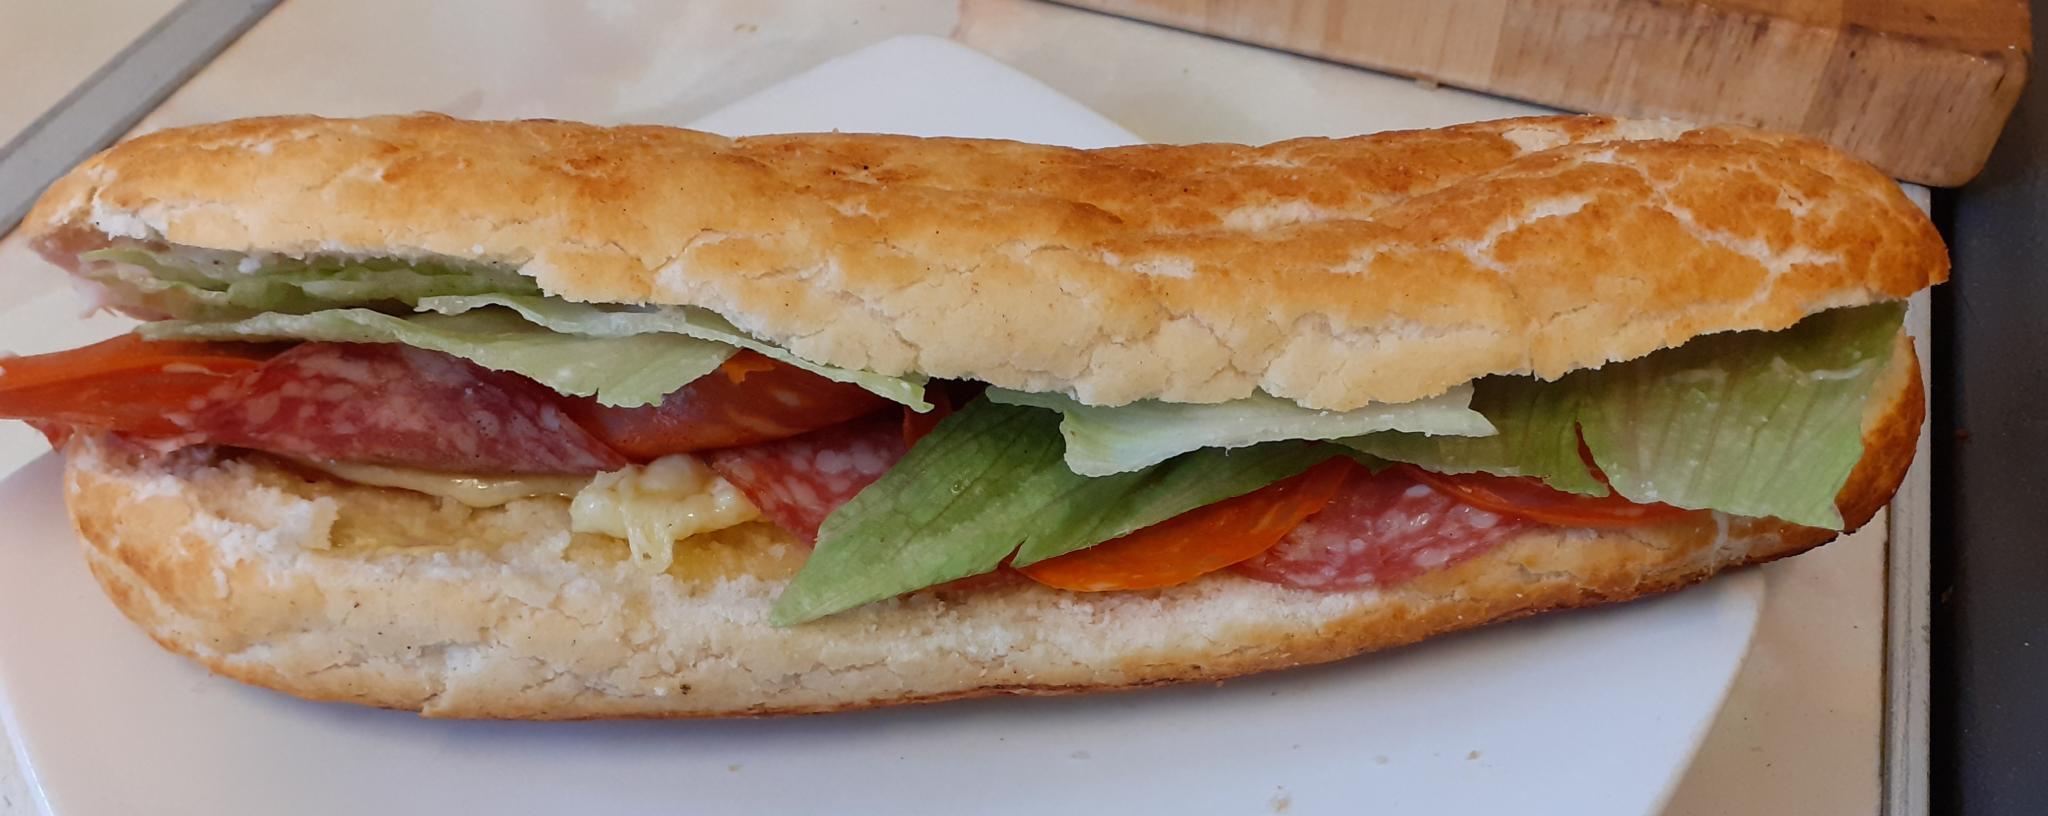 Manwiches-20200512_151623-jpg